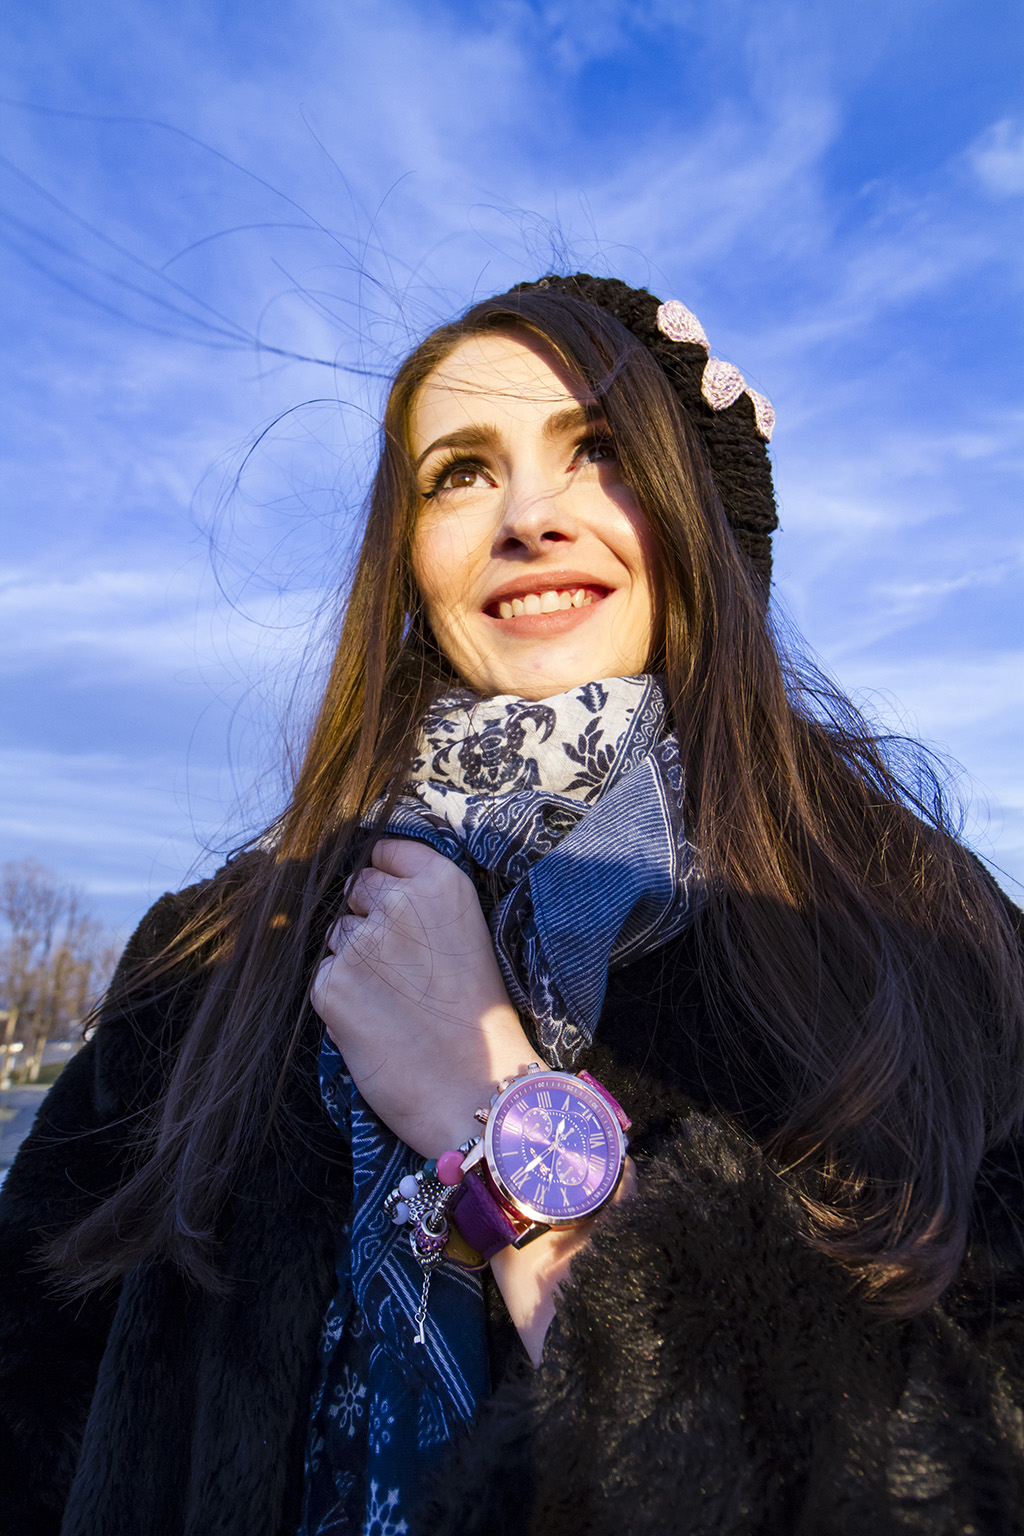 sun shine girl constanta mamaia pasarela apus outfit ootd ceas cizme amiclubwear